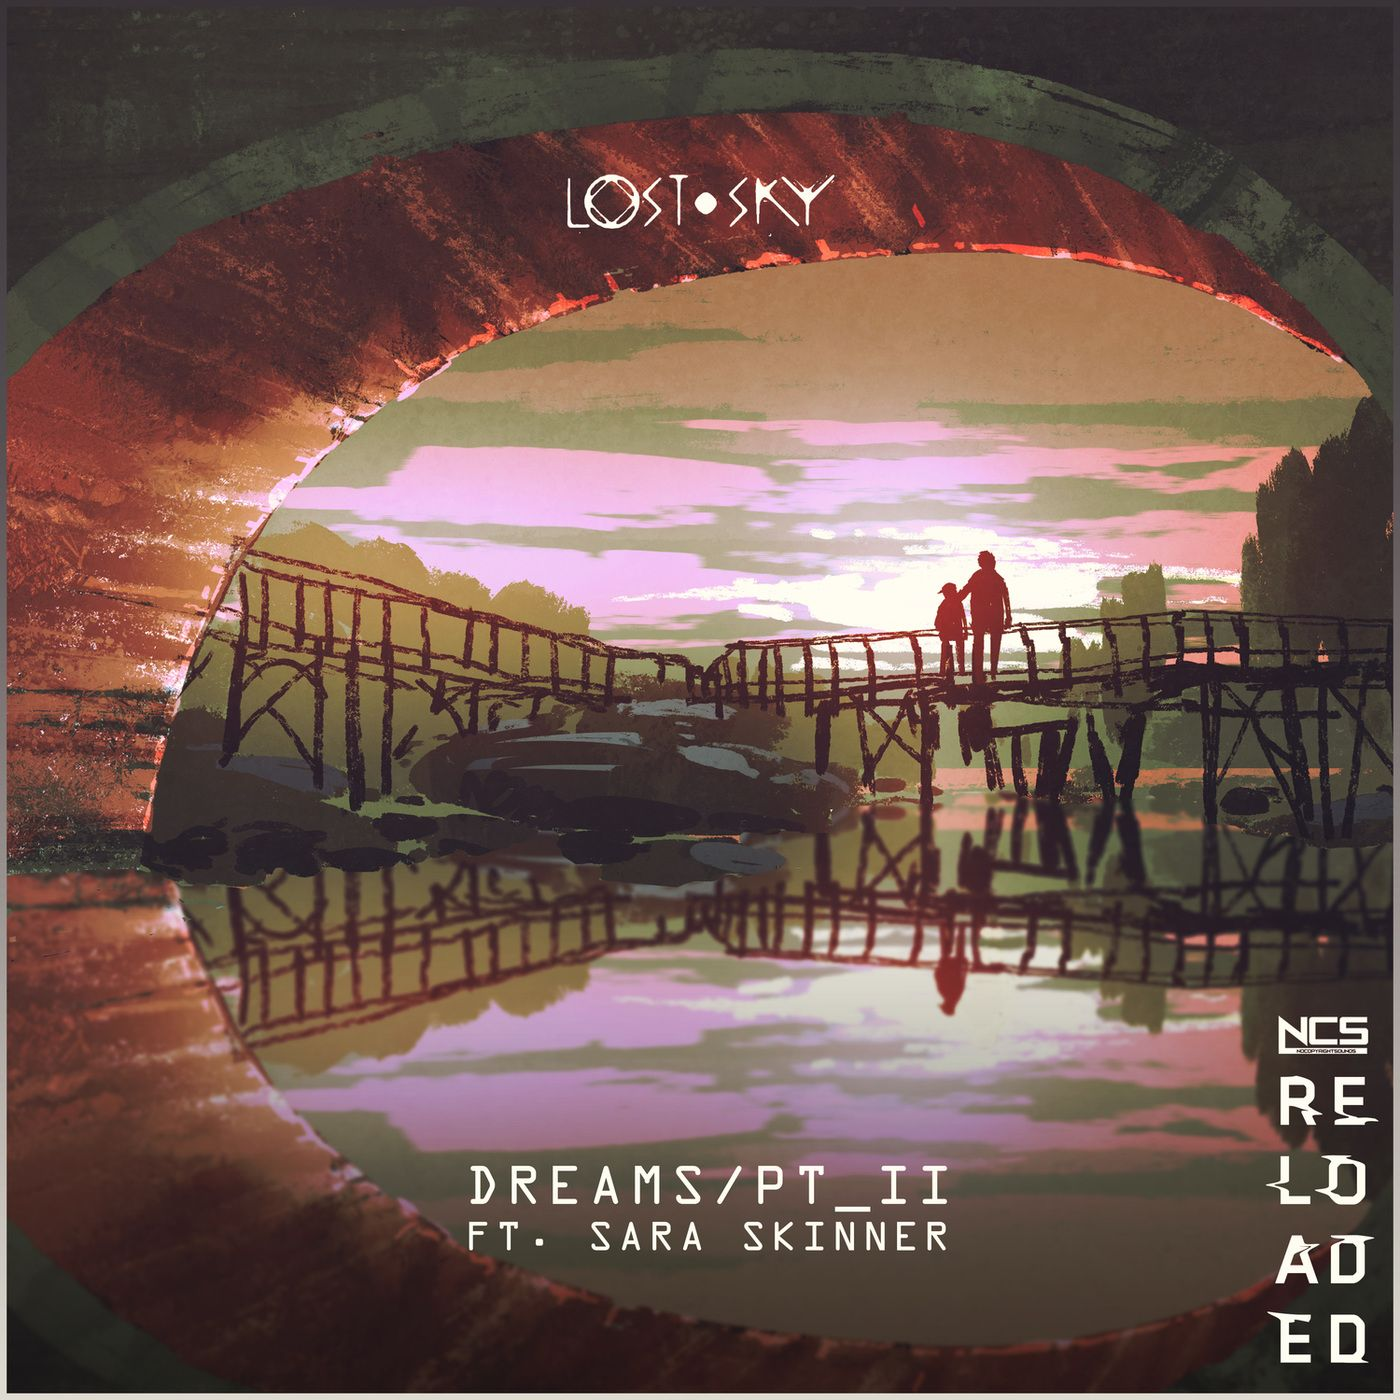 Lost Sky Dreams Part 2 Mp3 320kbps Download Dream Sky Copyright Music